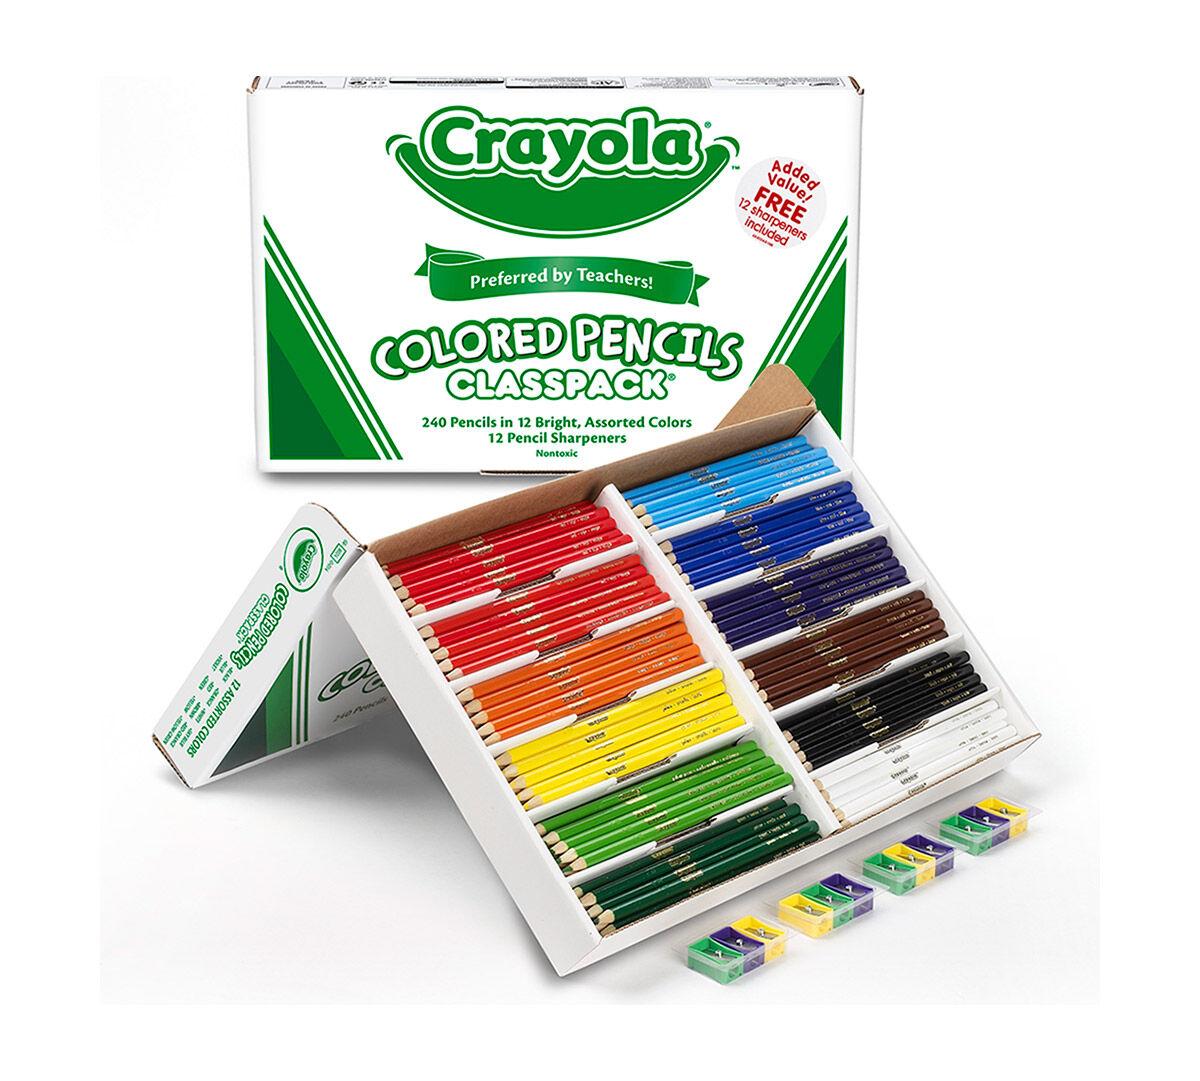 240 Count Colored Pencils Classpack 12 Colors Crayola